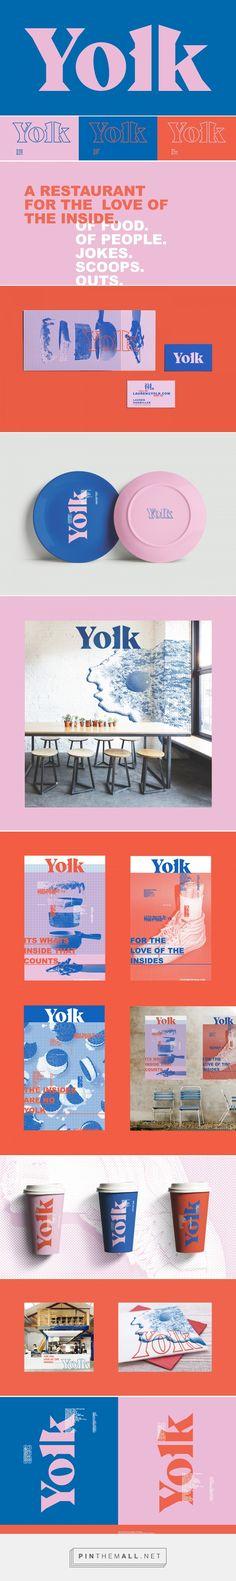 Yolk Restaurant Branding by Lauren Hakmiller